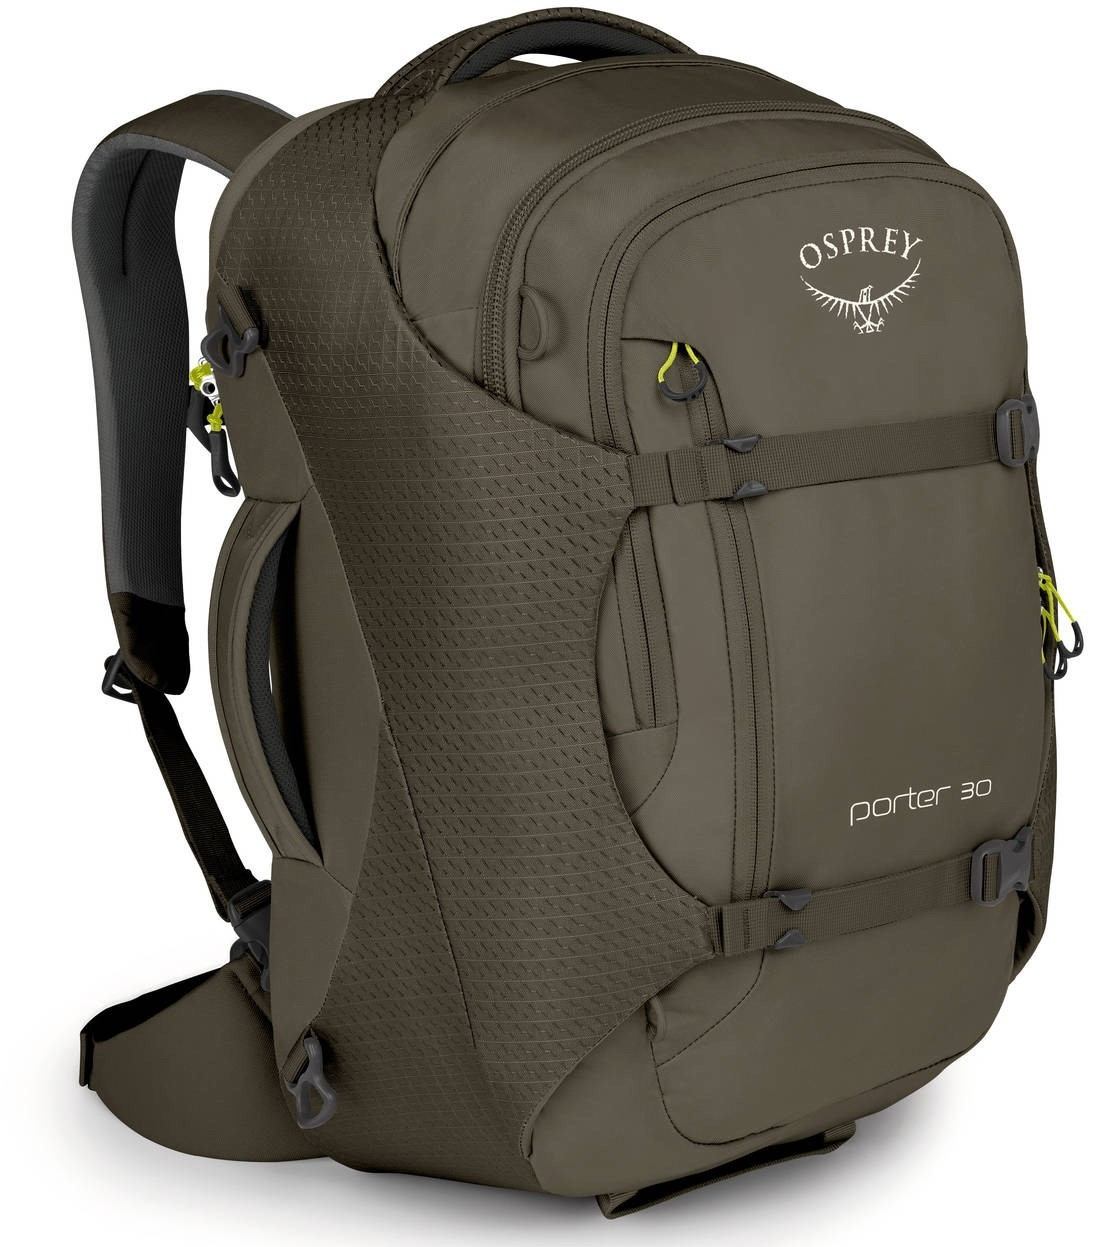 Сумки-рюкзаки Сумка-рюкзак Osprey Porter 30 Castle Grey Porter_30_F17_Side_Castle_Grey_web.jpg